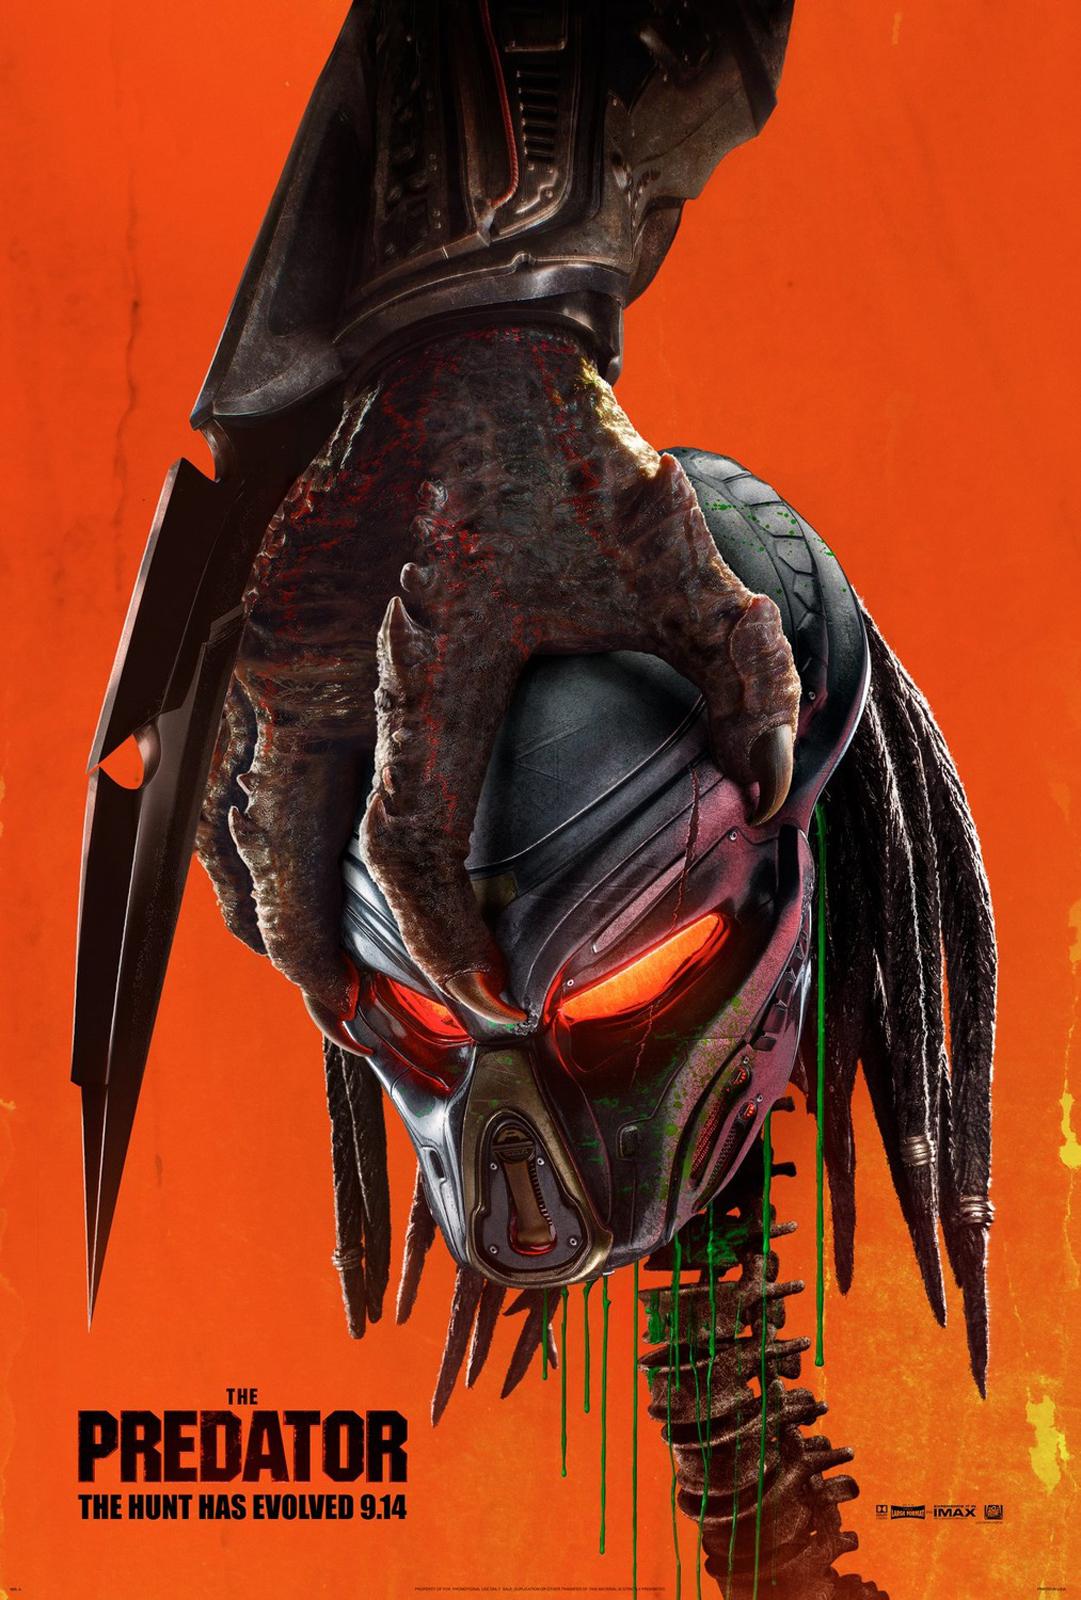 The Predator (film) | Xenopedia | FANDOM powered by Wikia